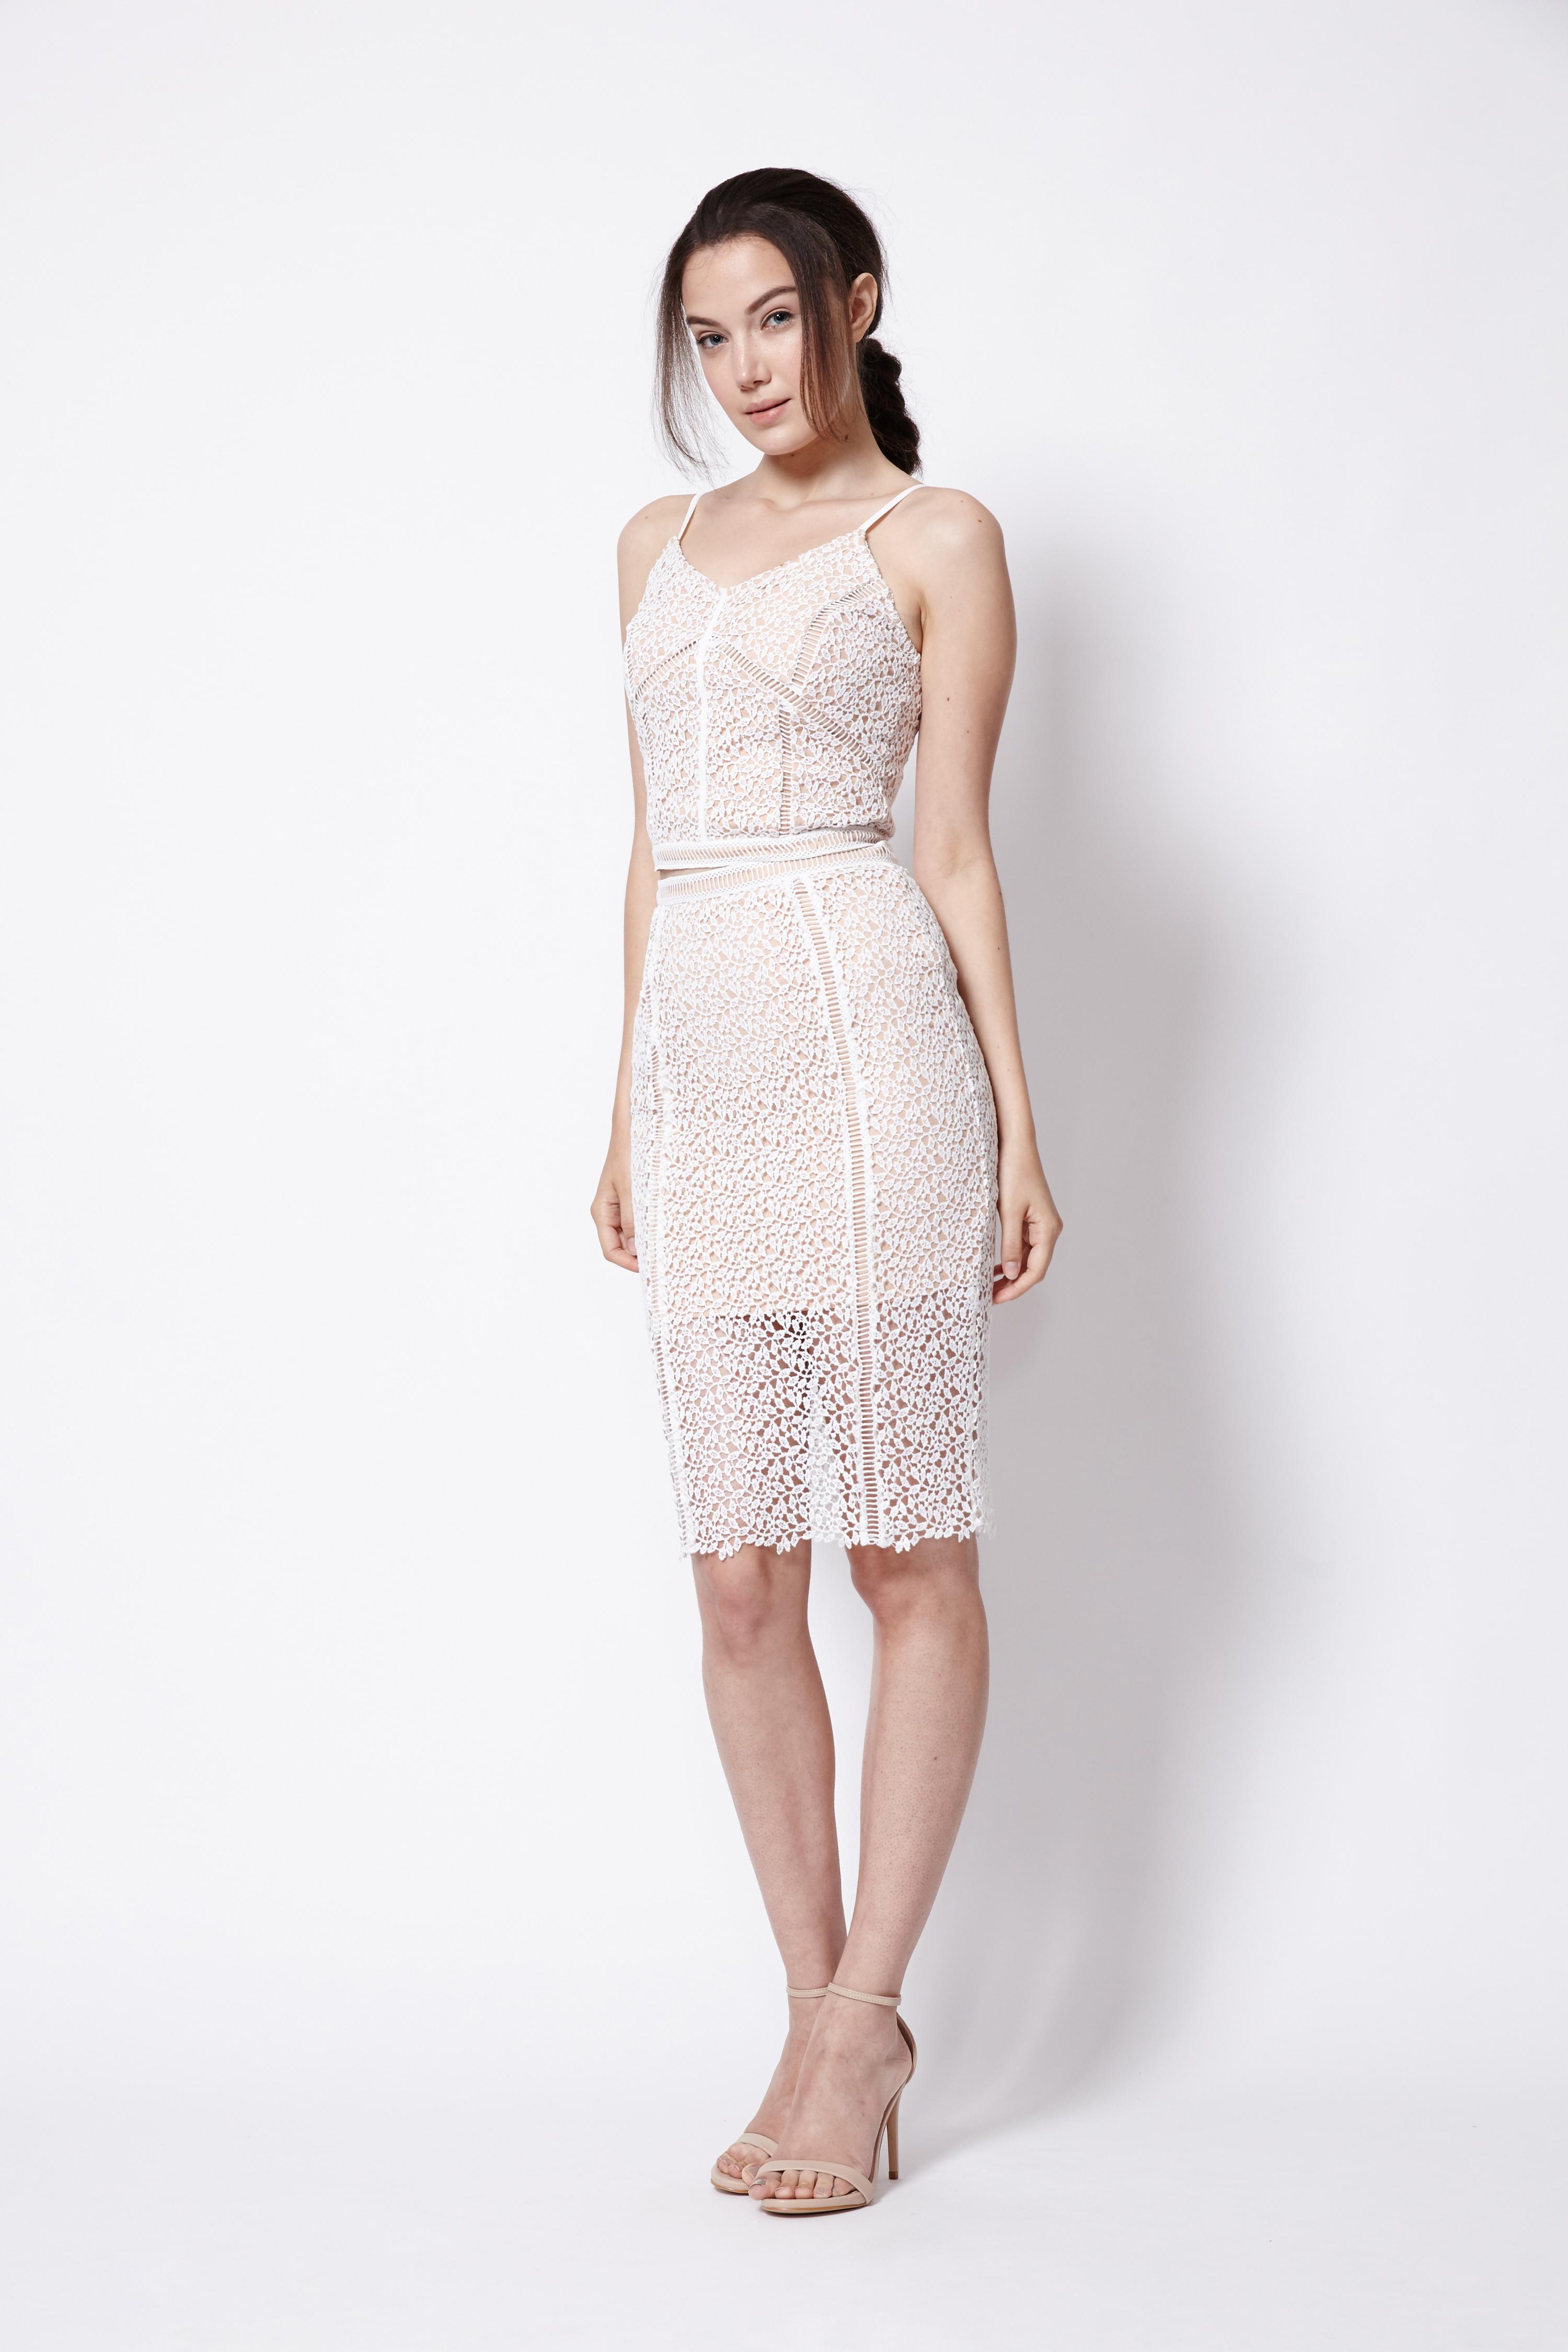 50010997a ... Chiara Fitted Midi Skirt in White. Share: Pinterest Tweet Facebook  Tumbler